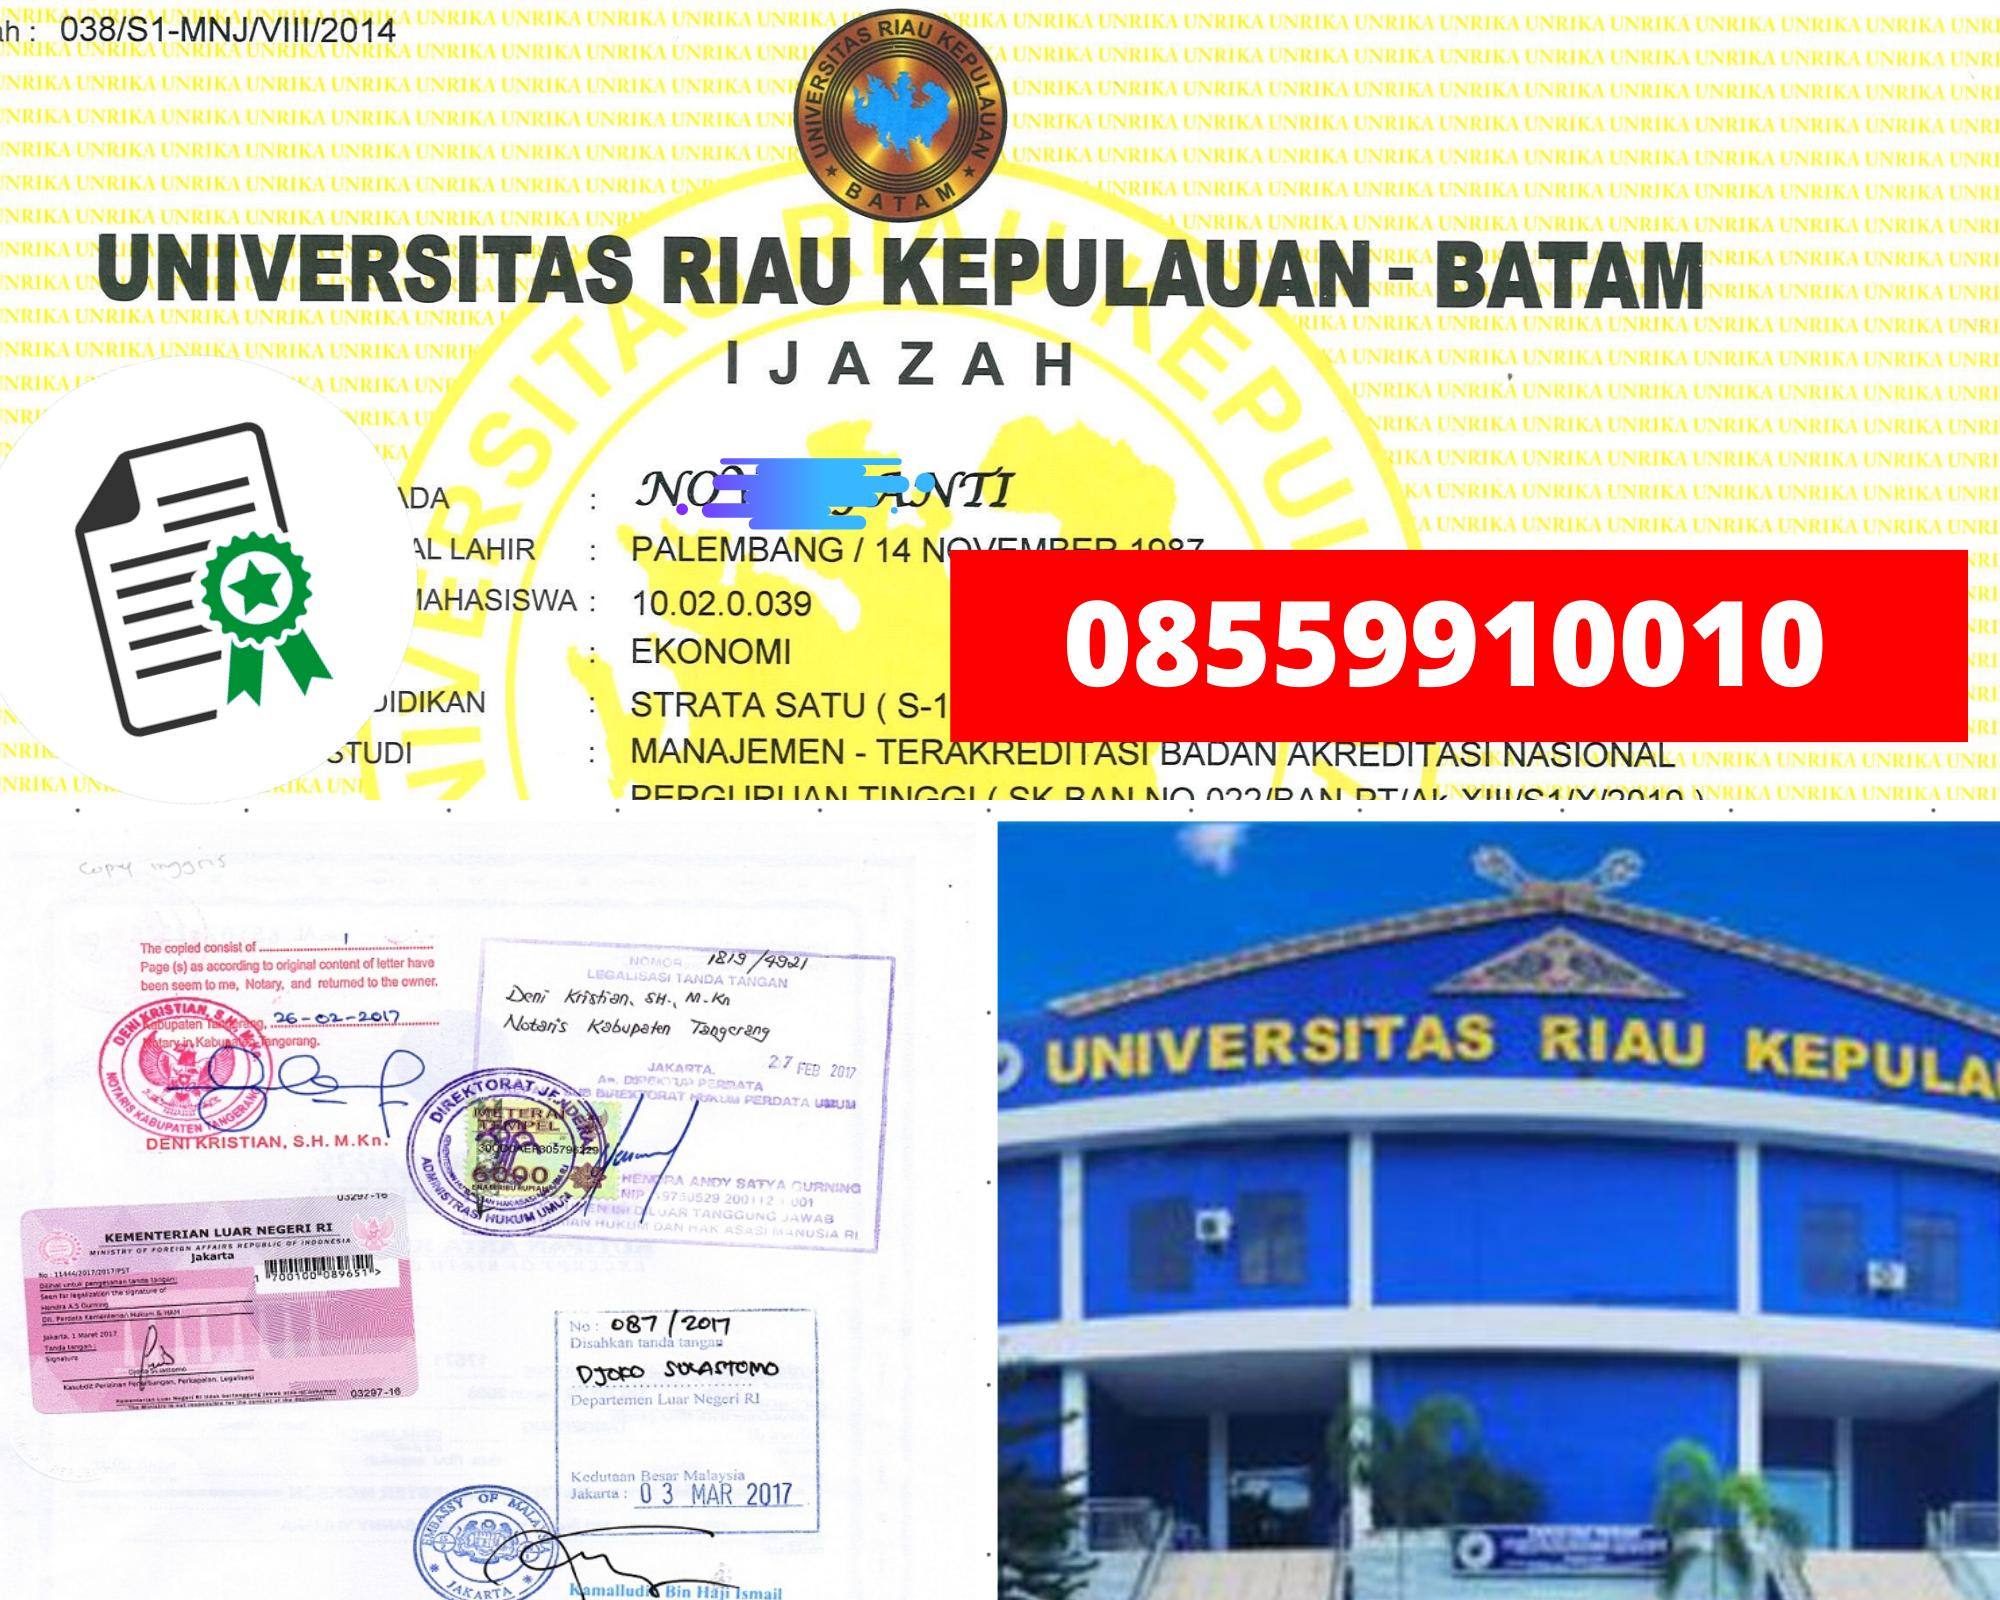 Legalisir Ijazah Universitas Riau Kepulauan-Batam Di Kemenristek Dikti || 08559910010